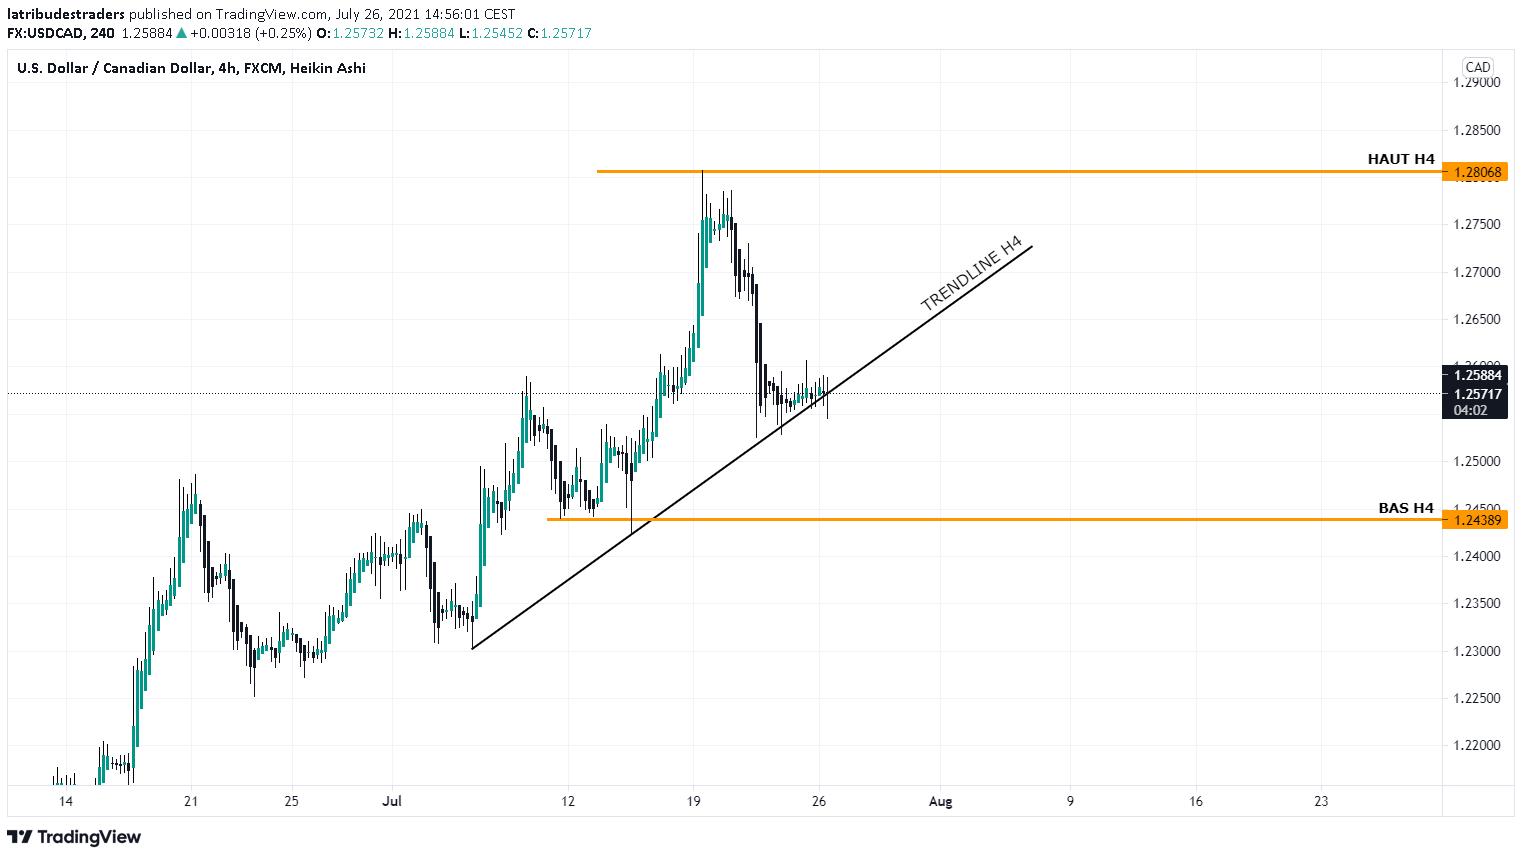 EUR/USD M1 PRICE ACTION